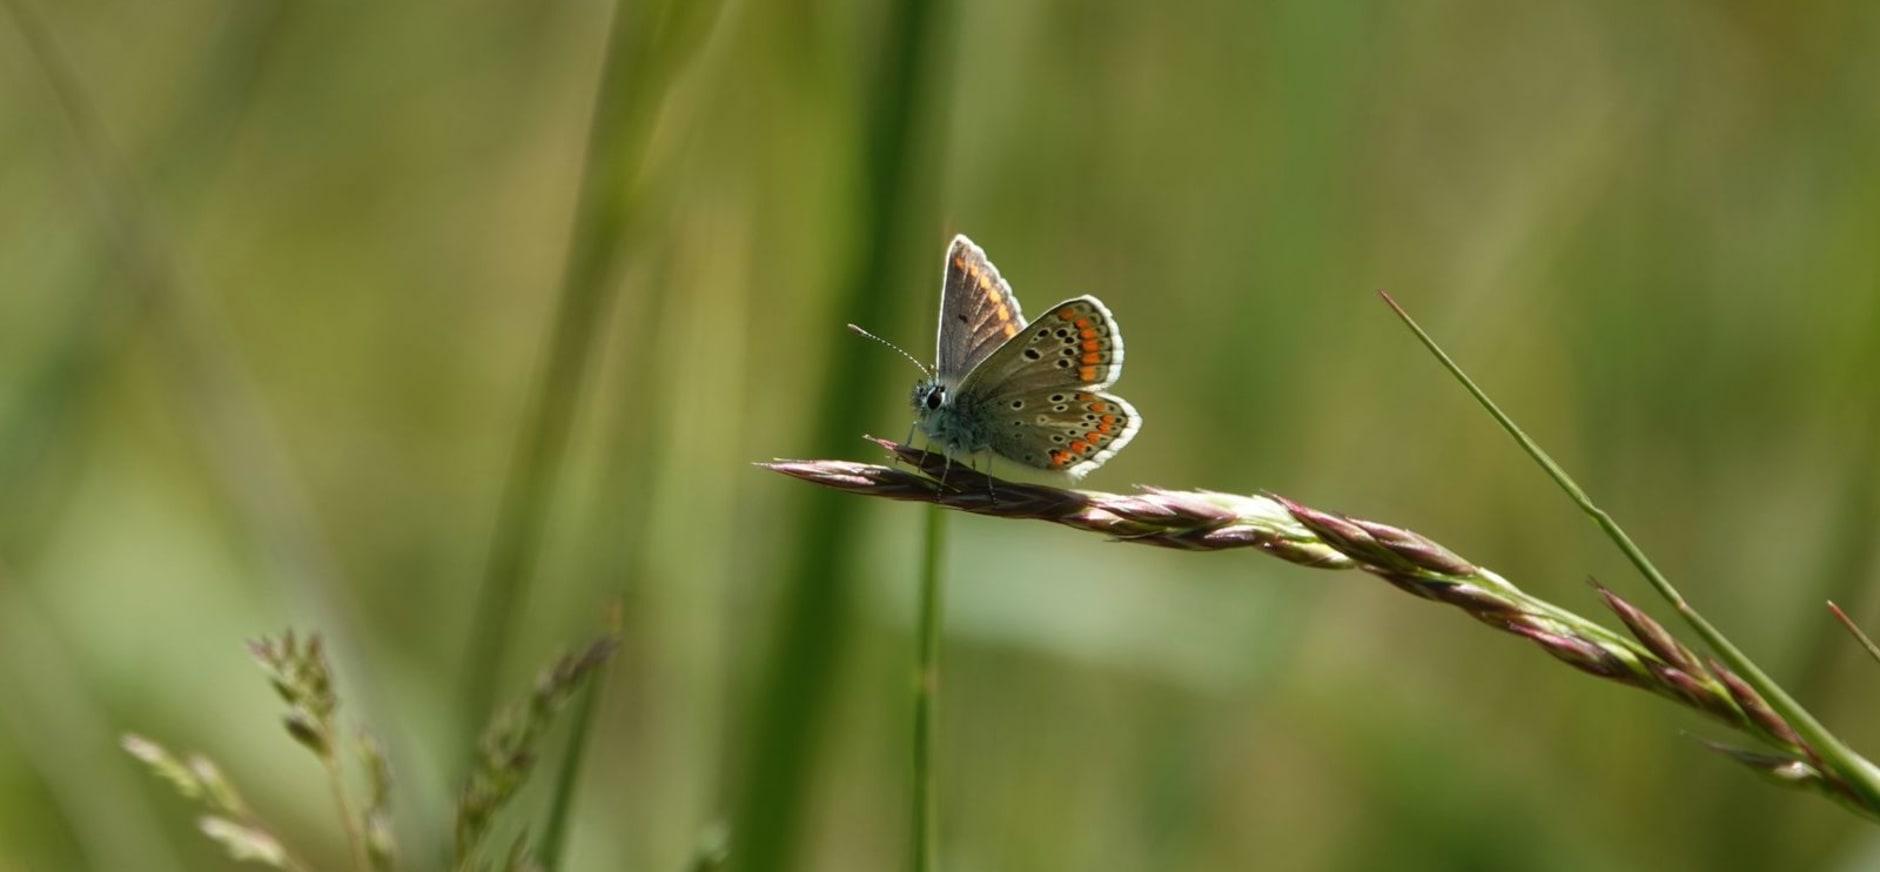 Bruin blauwtje (aricia agestis) - NM Arjan van Lomwel